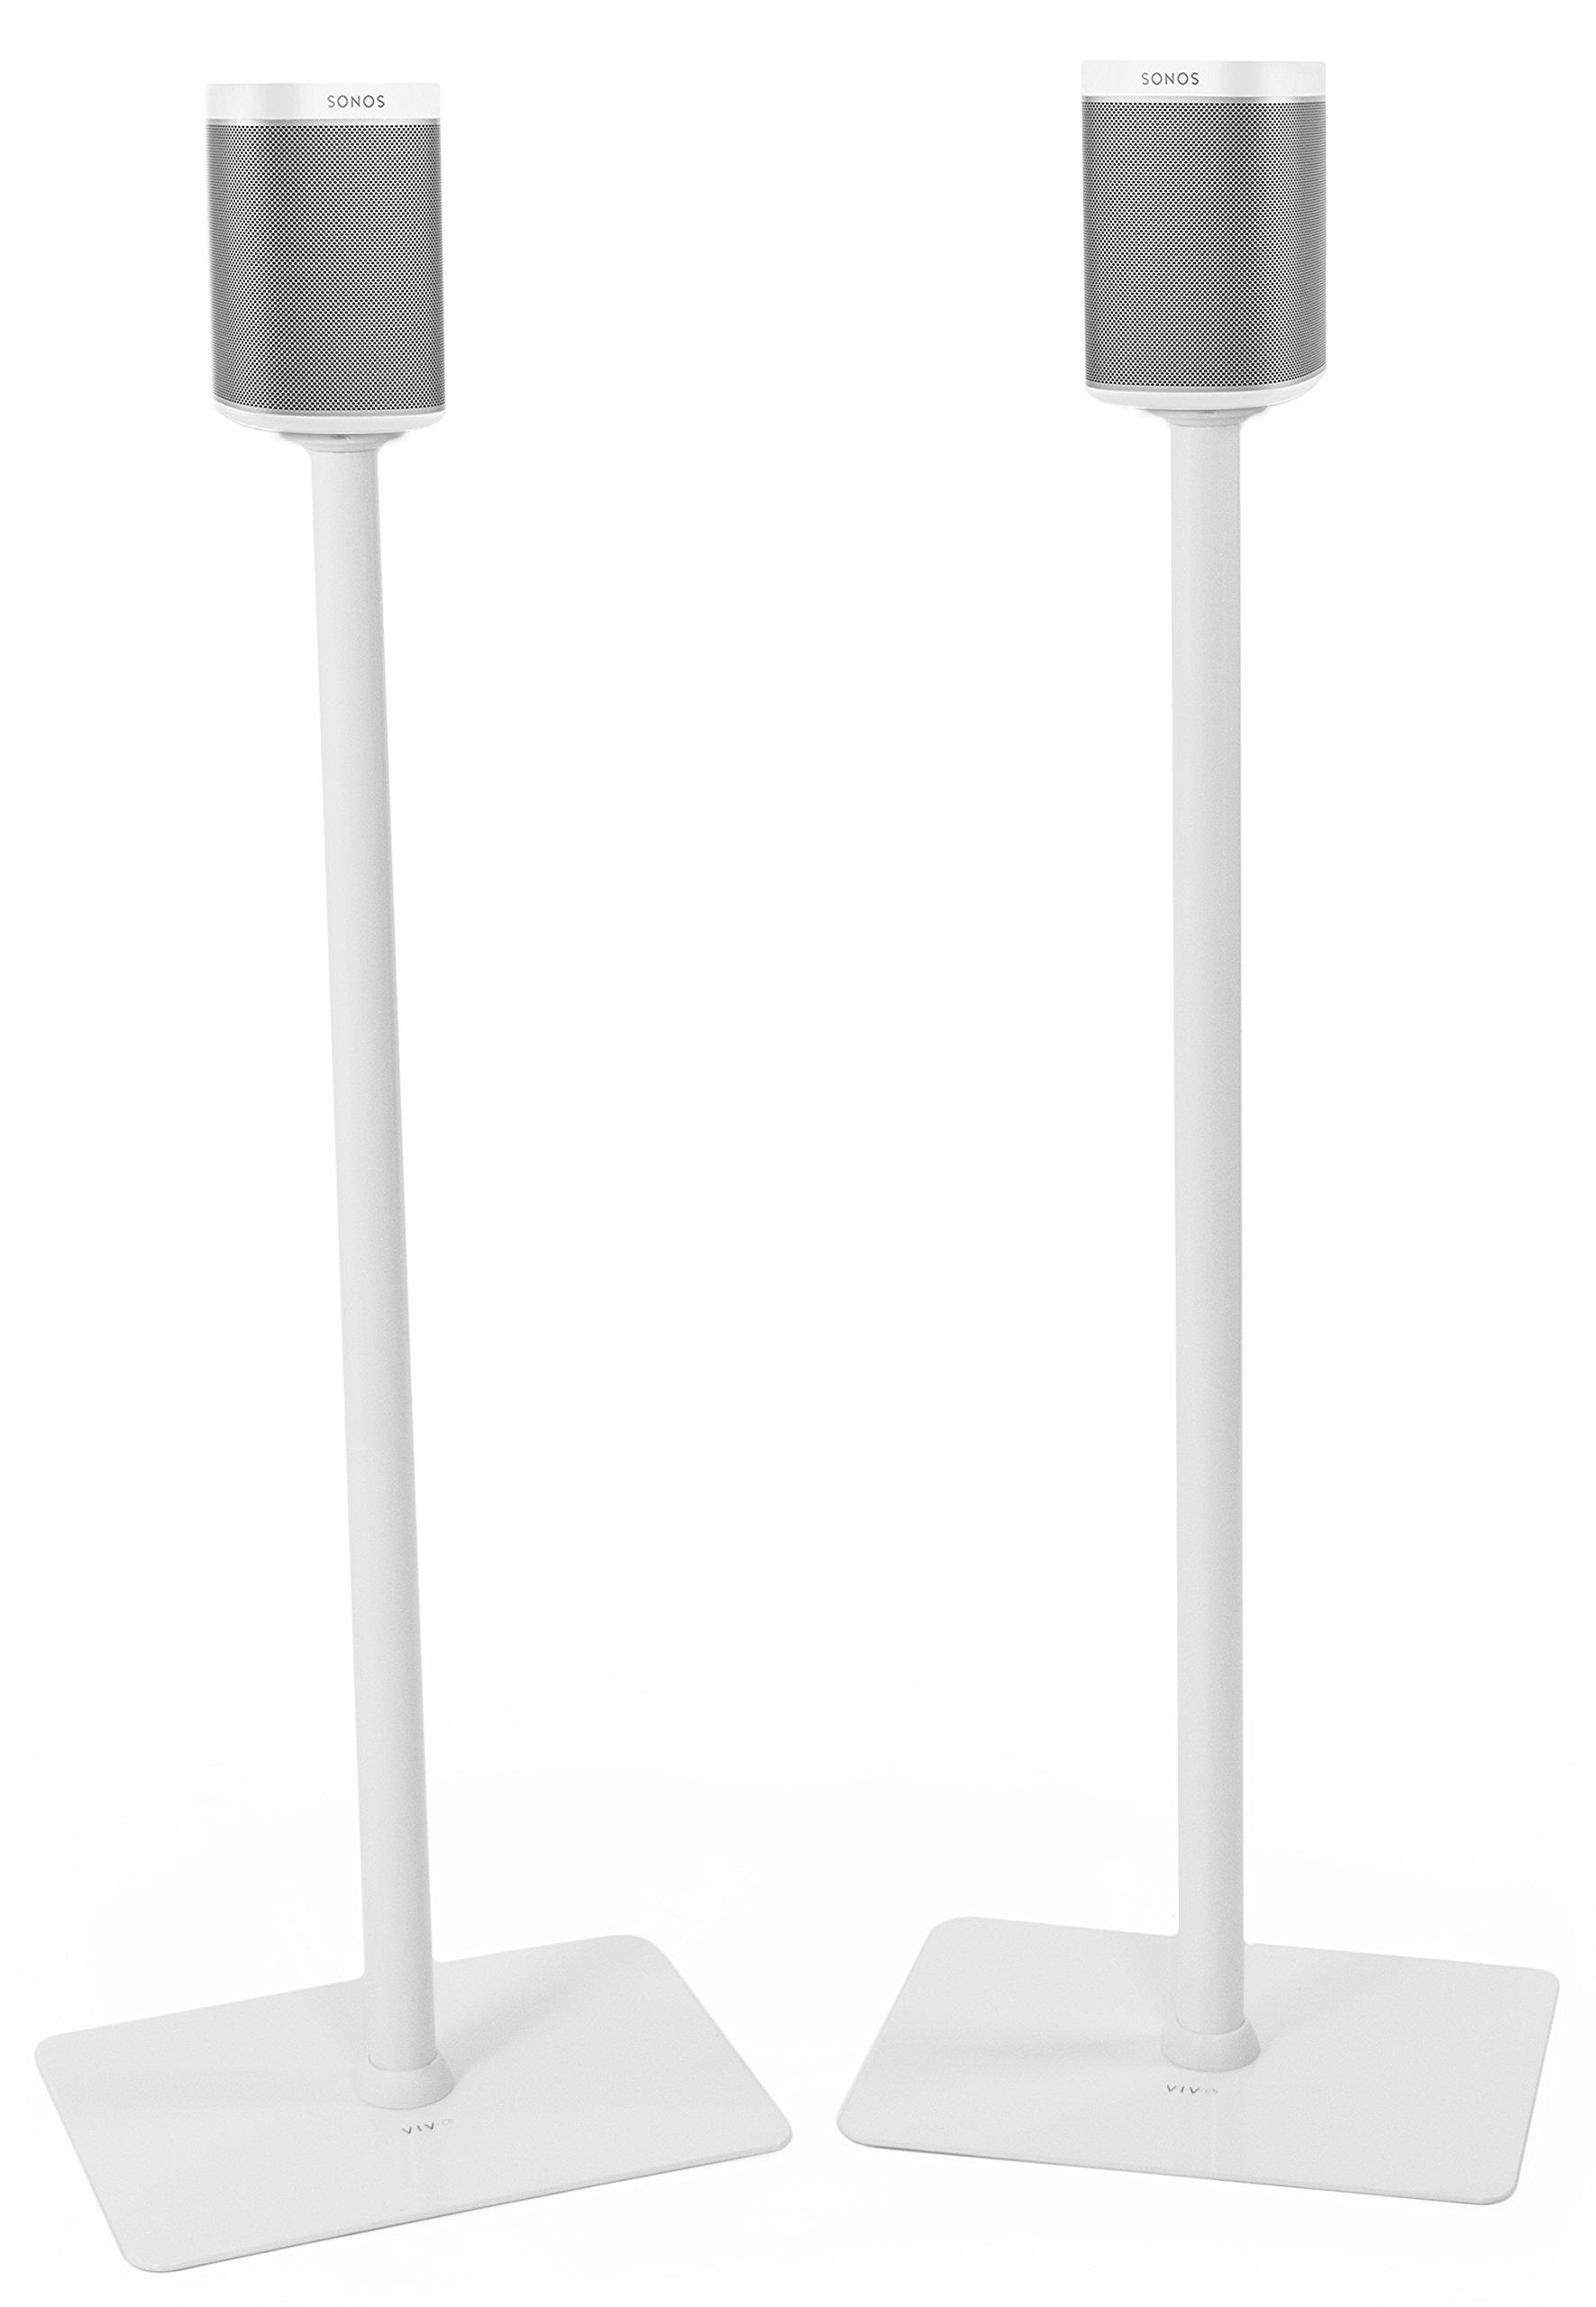 VIVO White Speaker Floor Stands (Pair) Designed for SONOS PLAY 1 and PLAY 3 Audio Speaker Freestanding Bracket Mounts (STAND-SP03W)